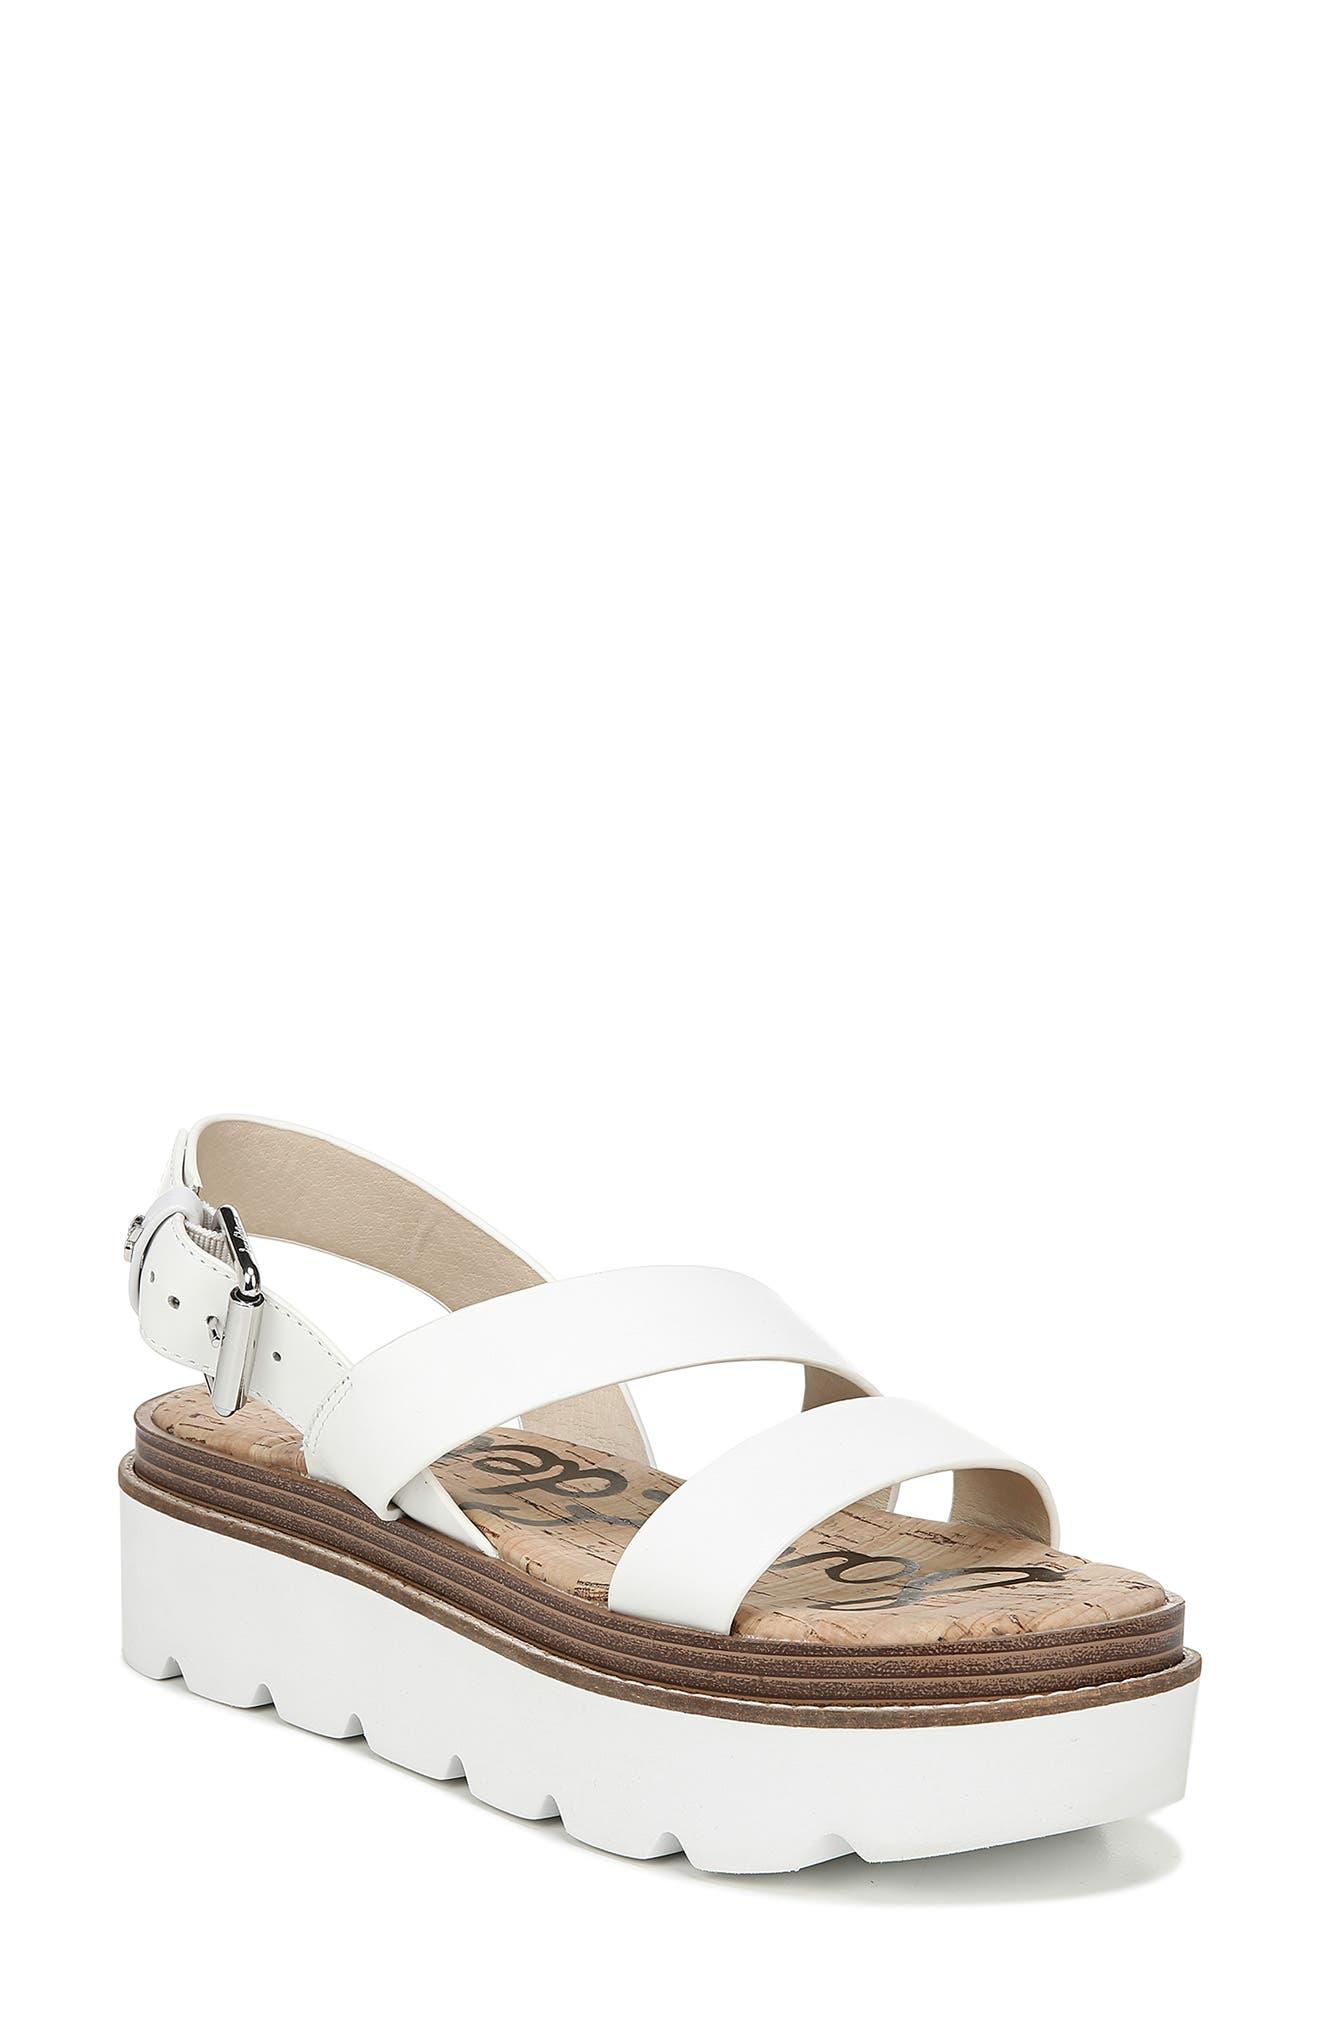 Sam Edelman Rasheed Slingback Platform Sandal, White